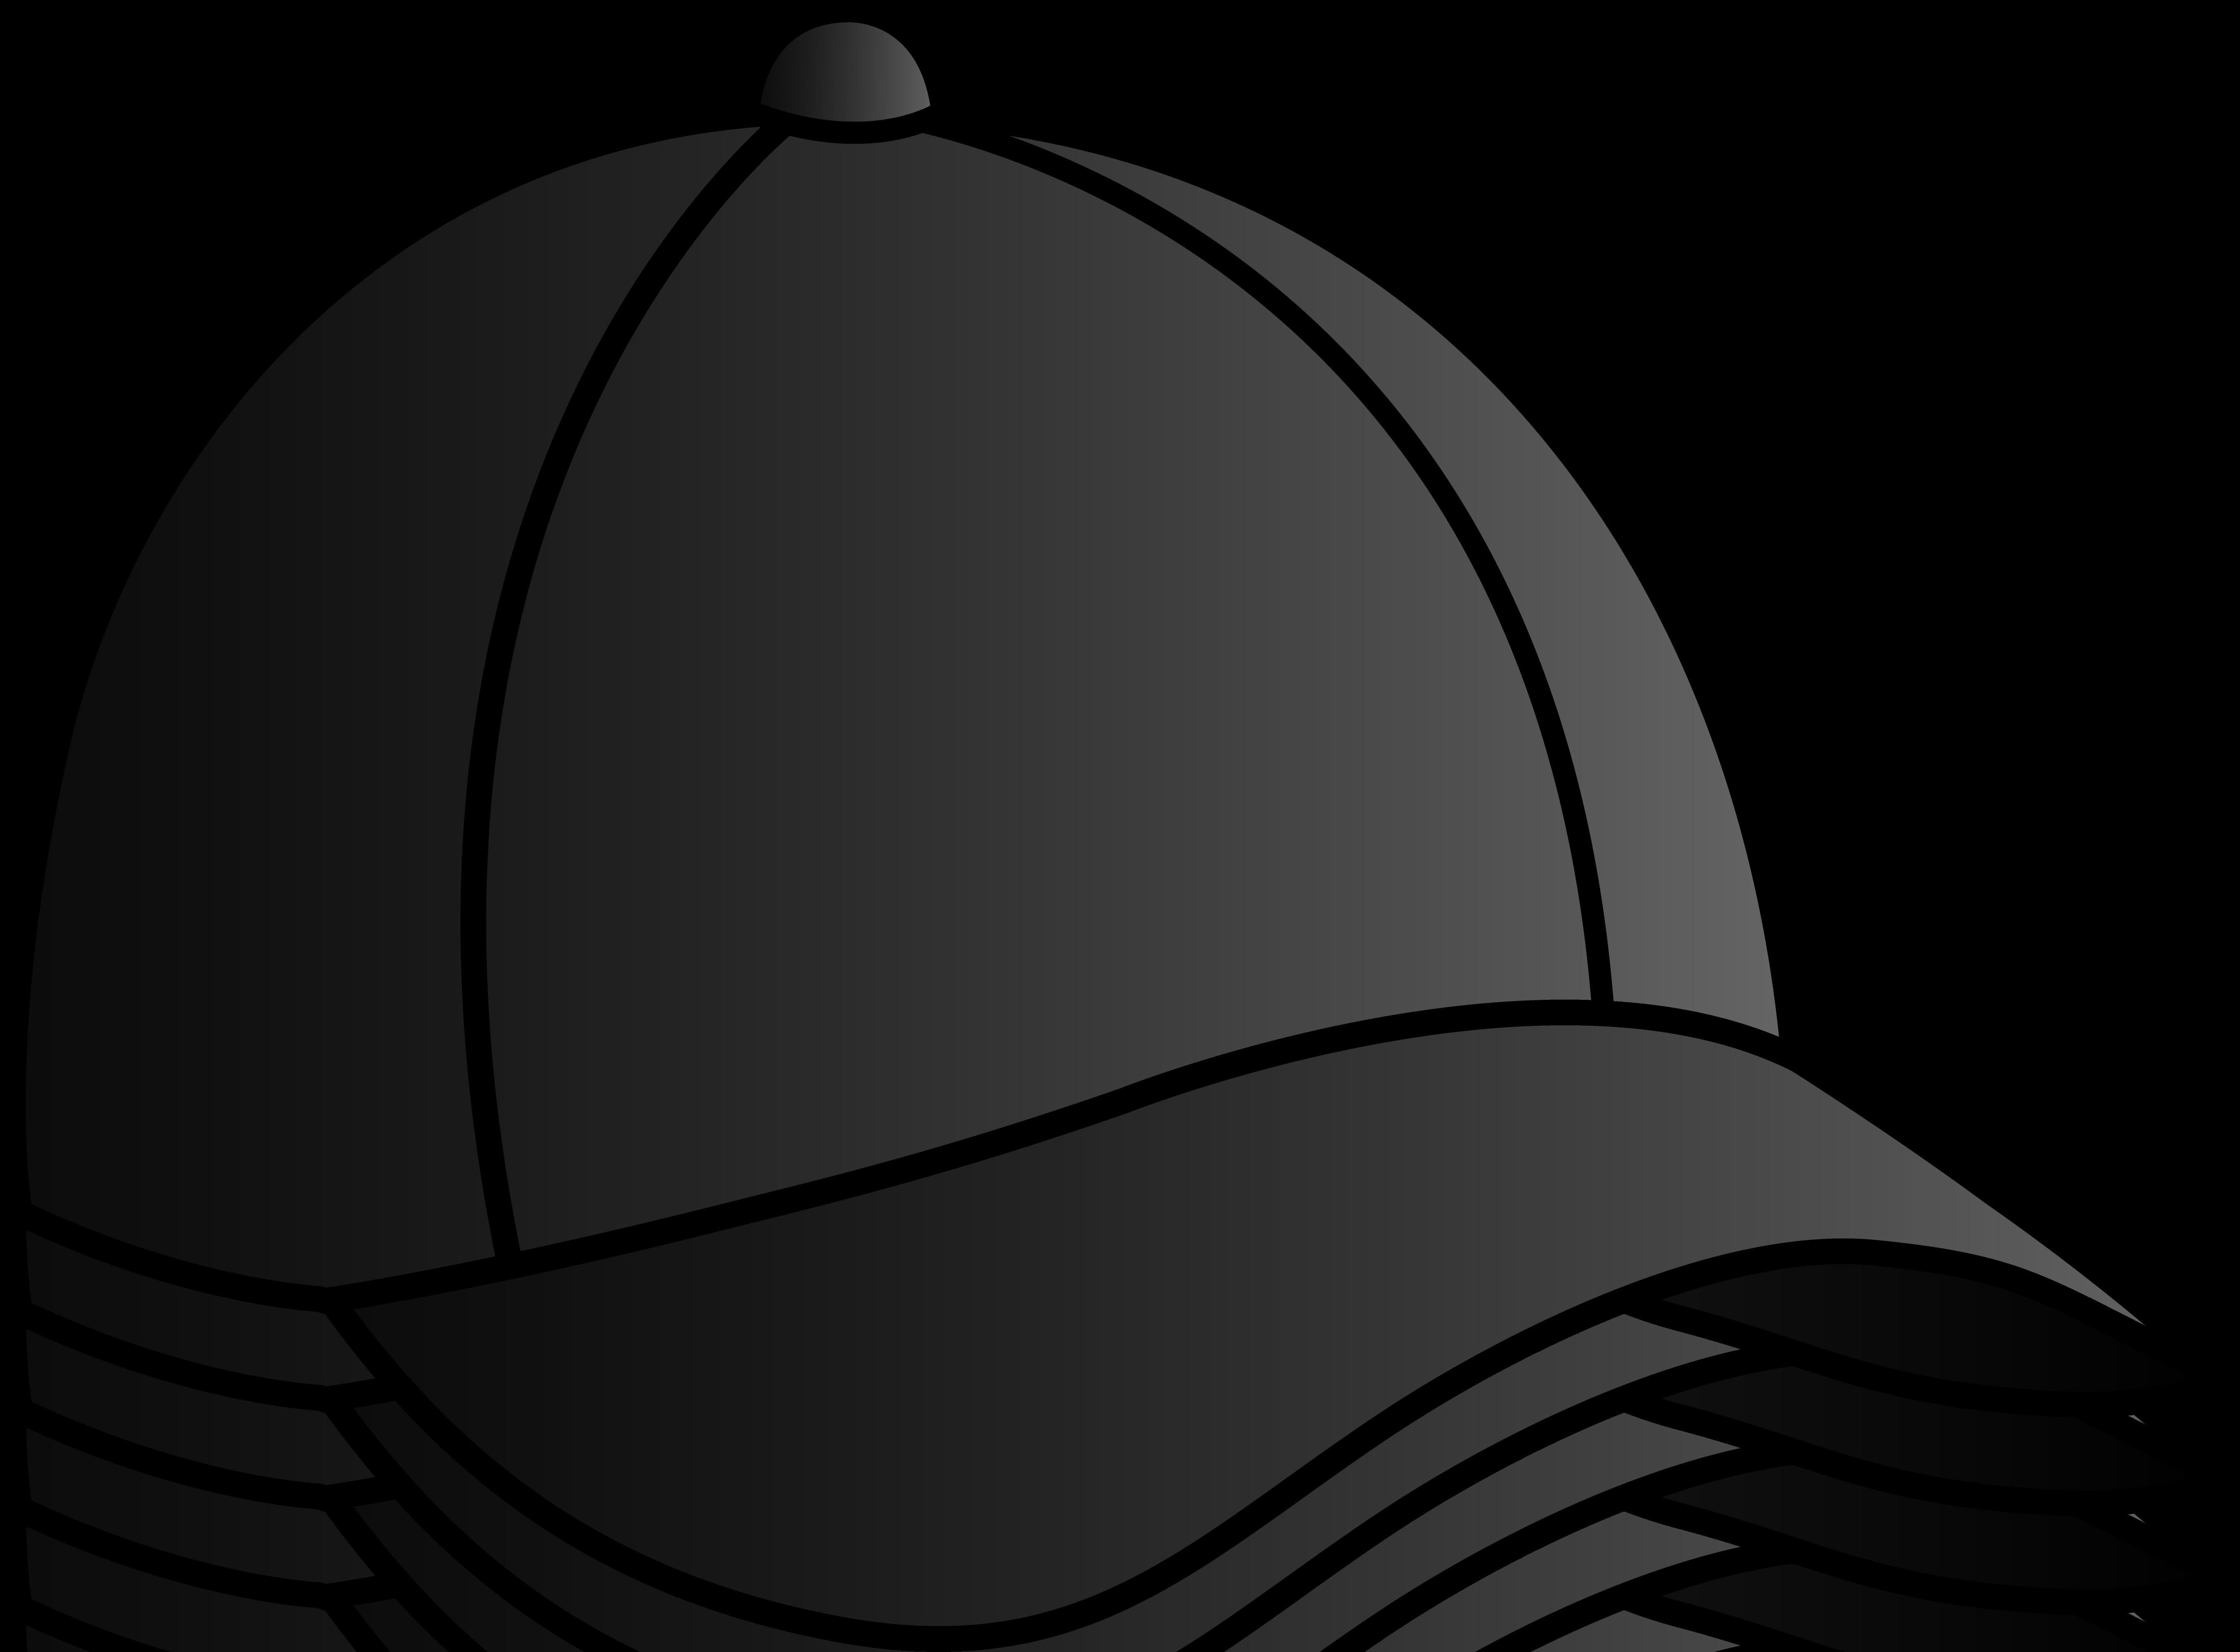 5444x4015 Black Baseball Cap